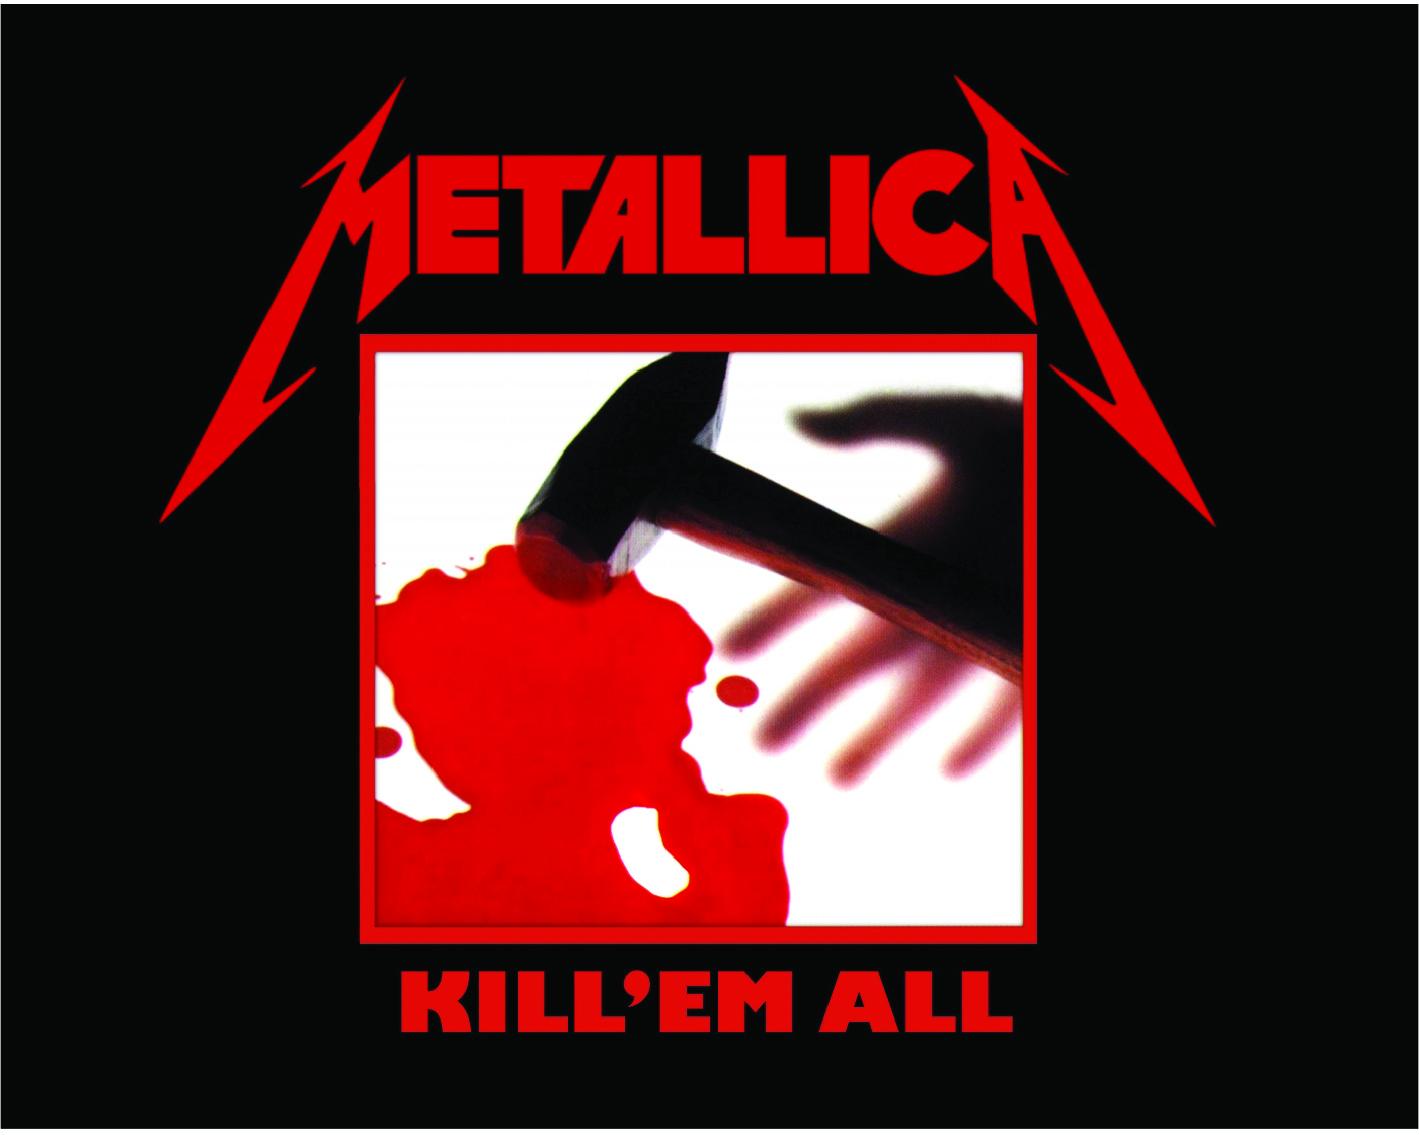 Metallica 1-4-04